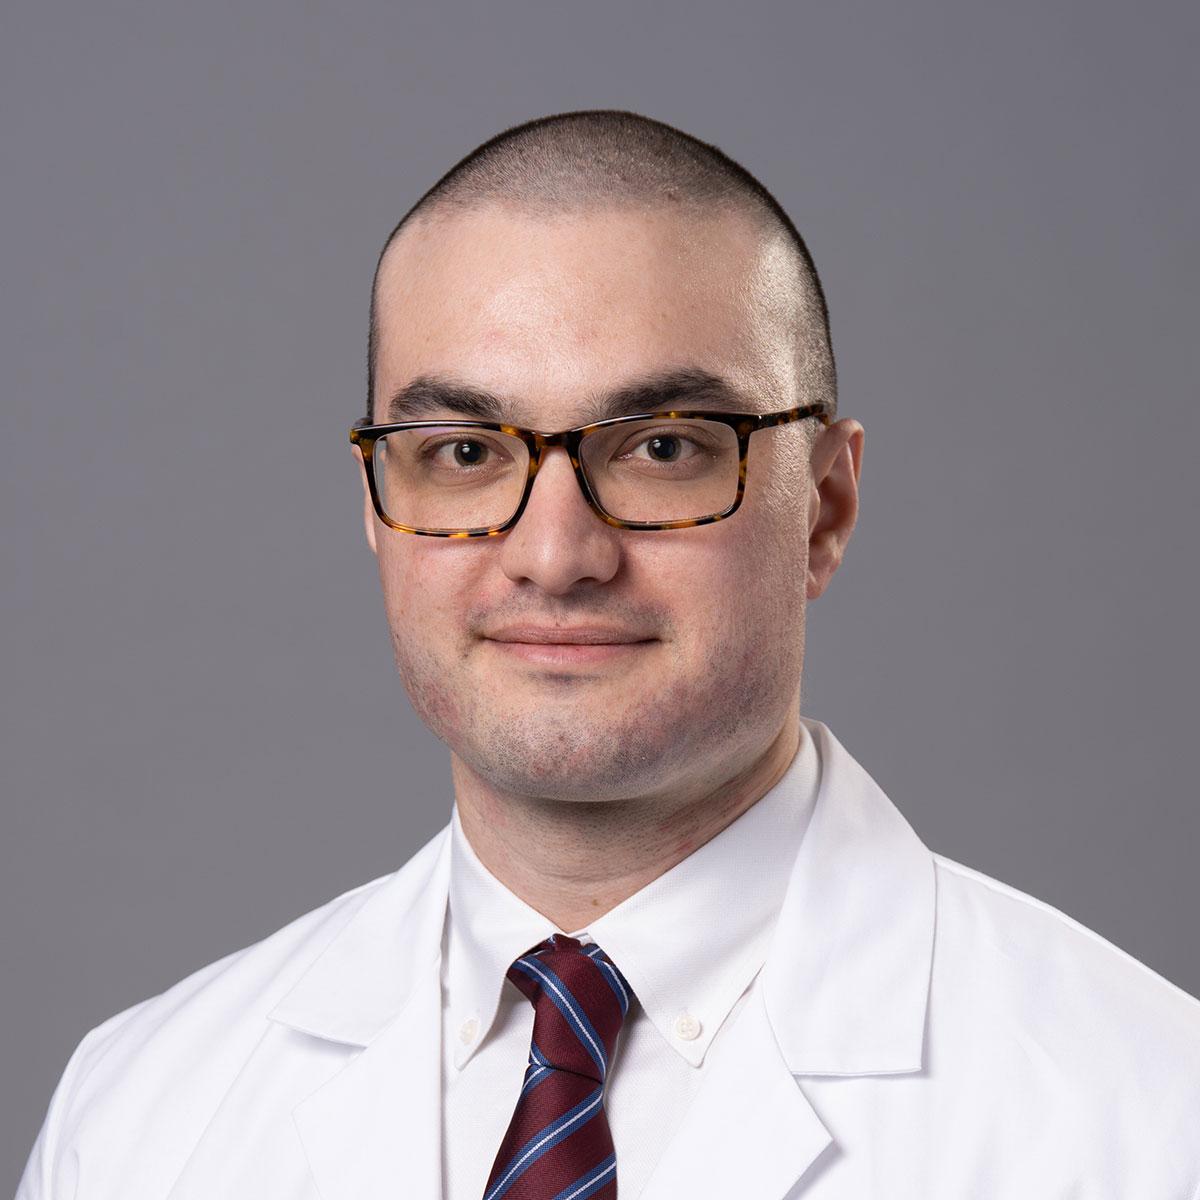 A friendly headshot of Dr. Lugman Croal-Abraham